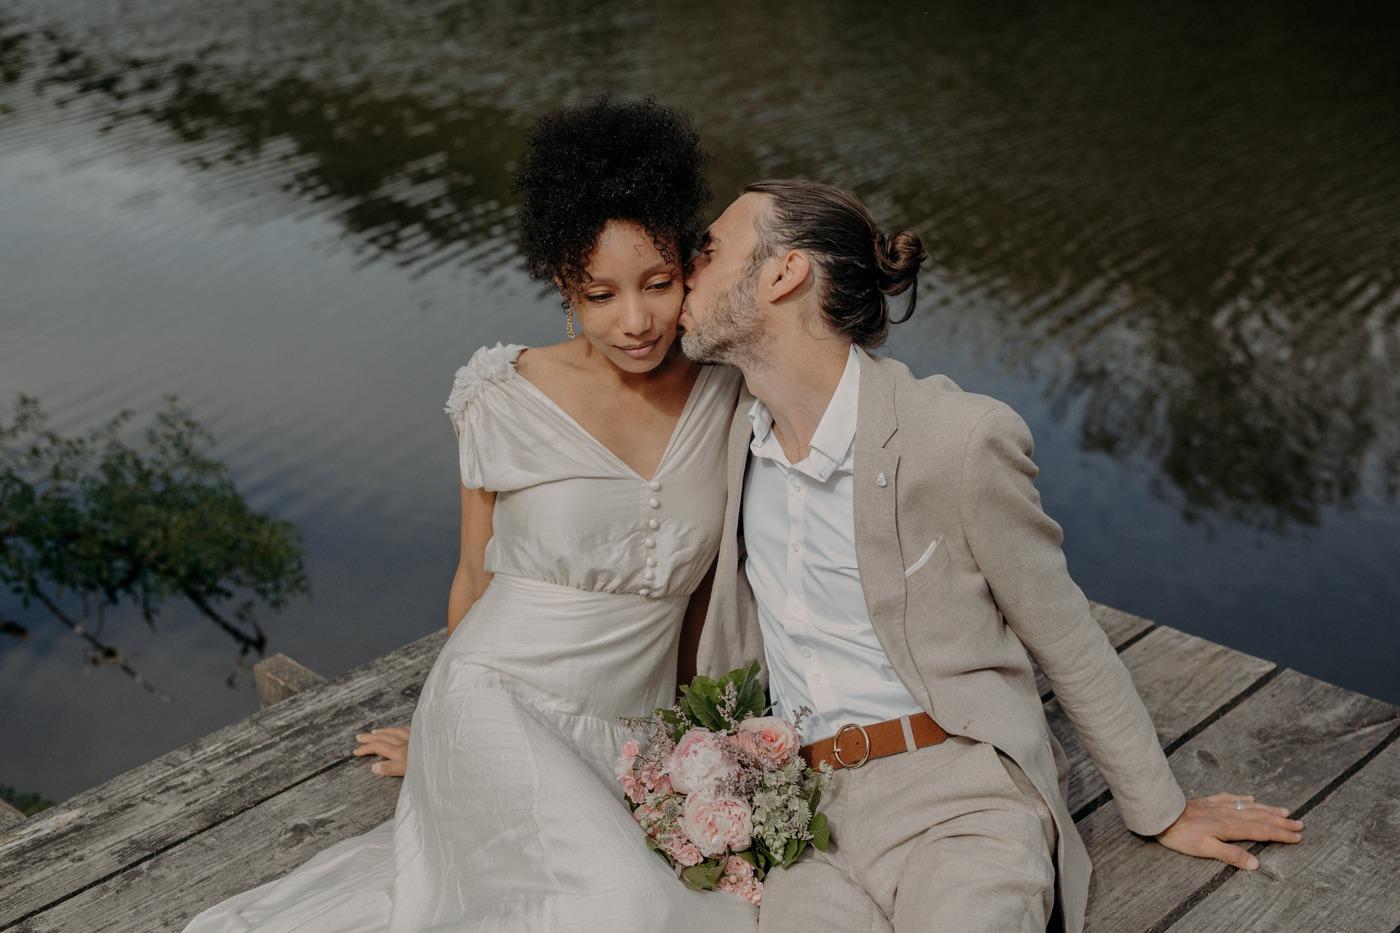 rennes-claire-huteau-mariage-photographie-reportage